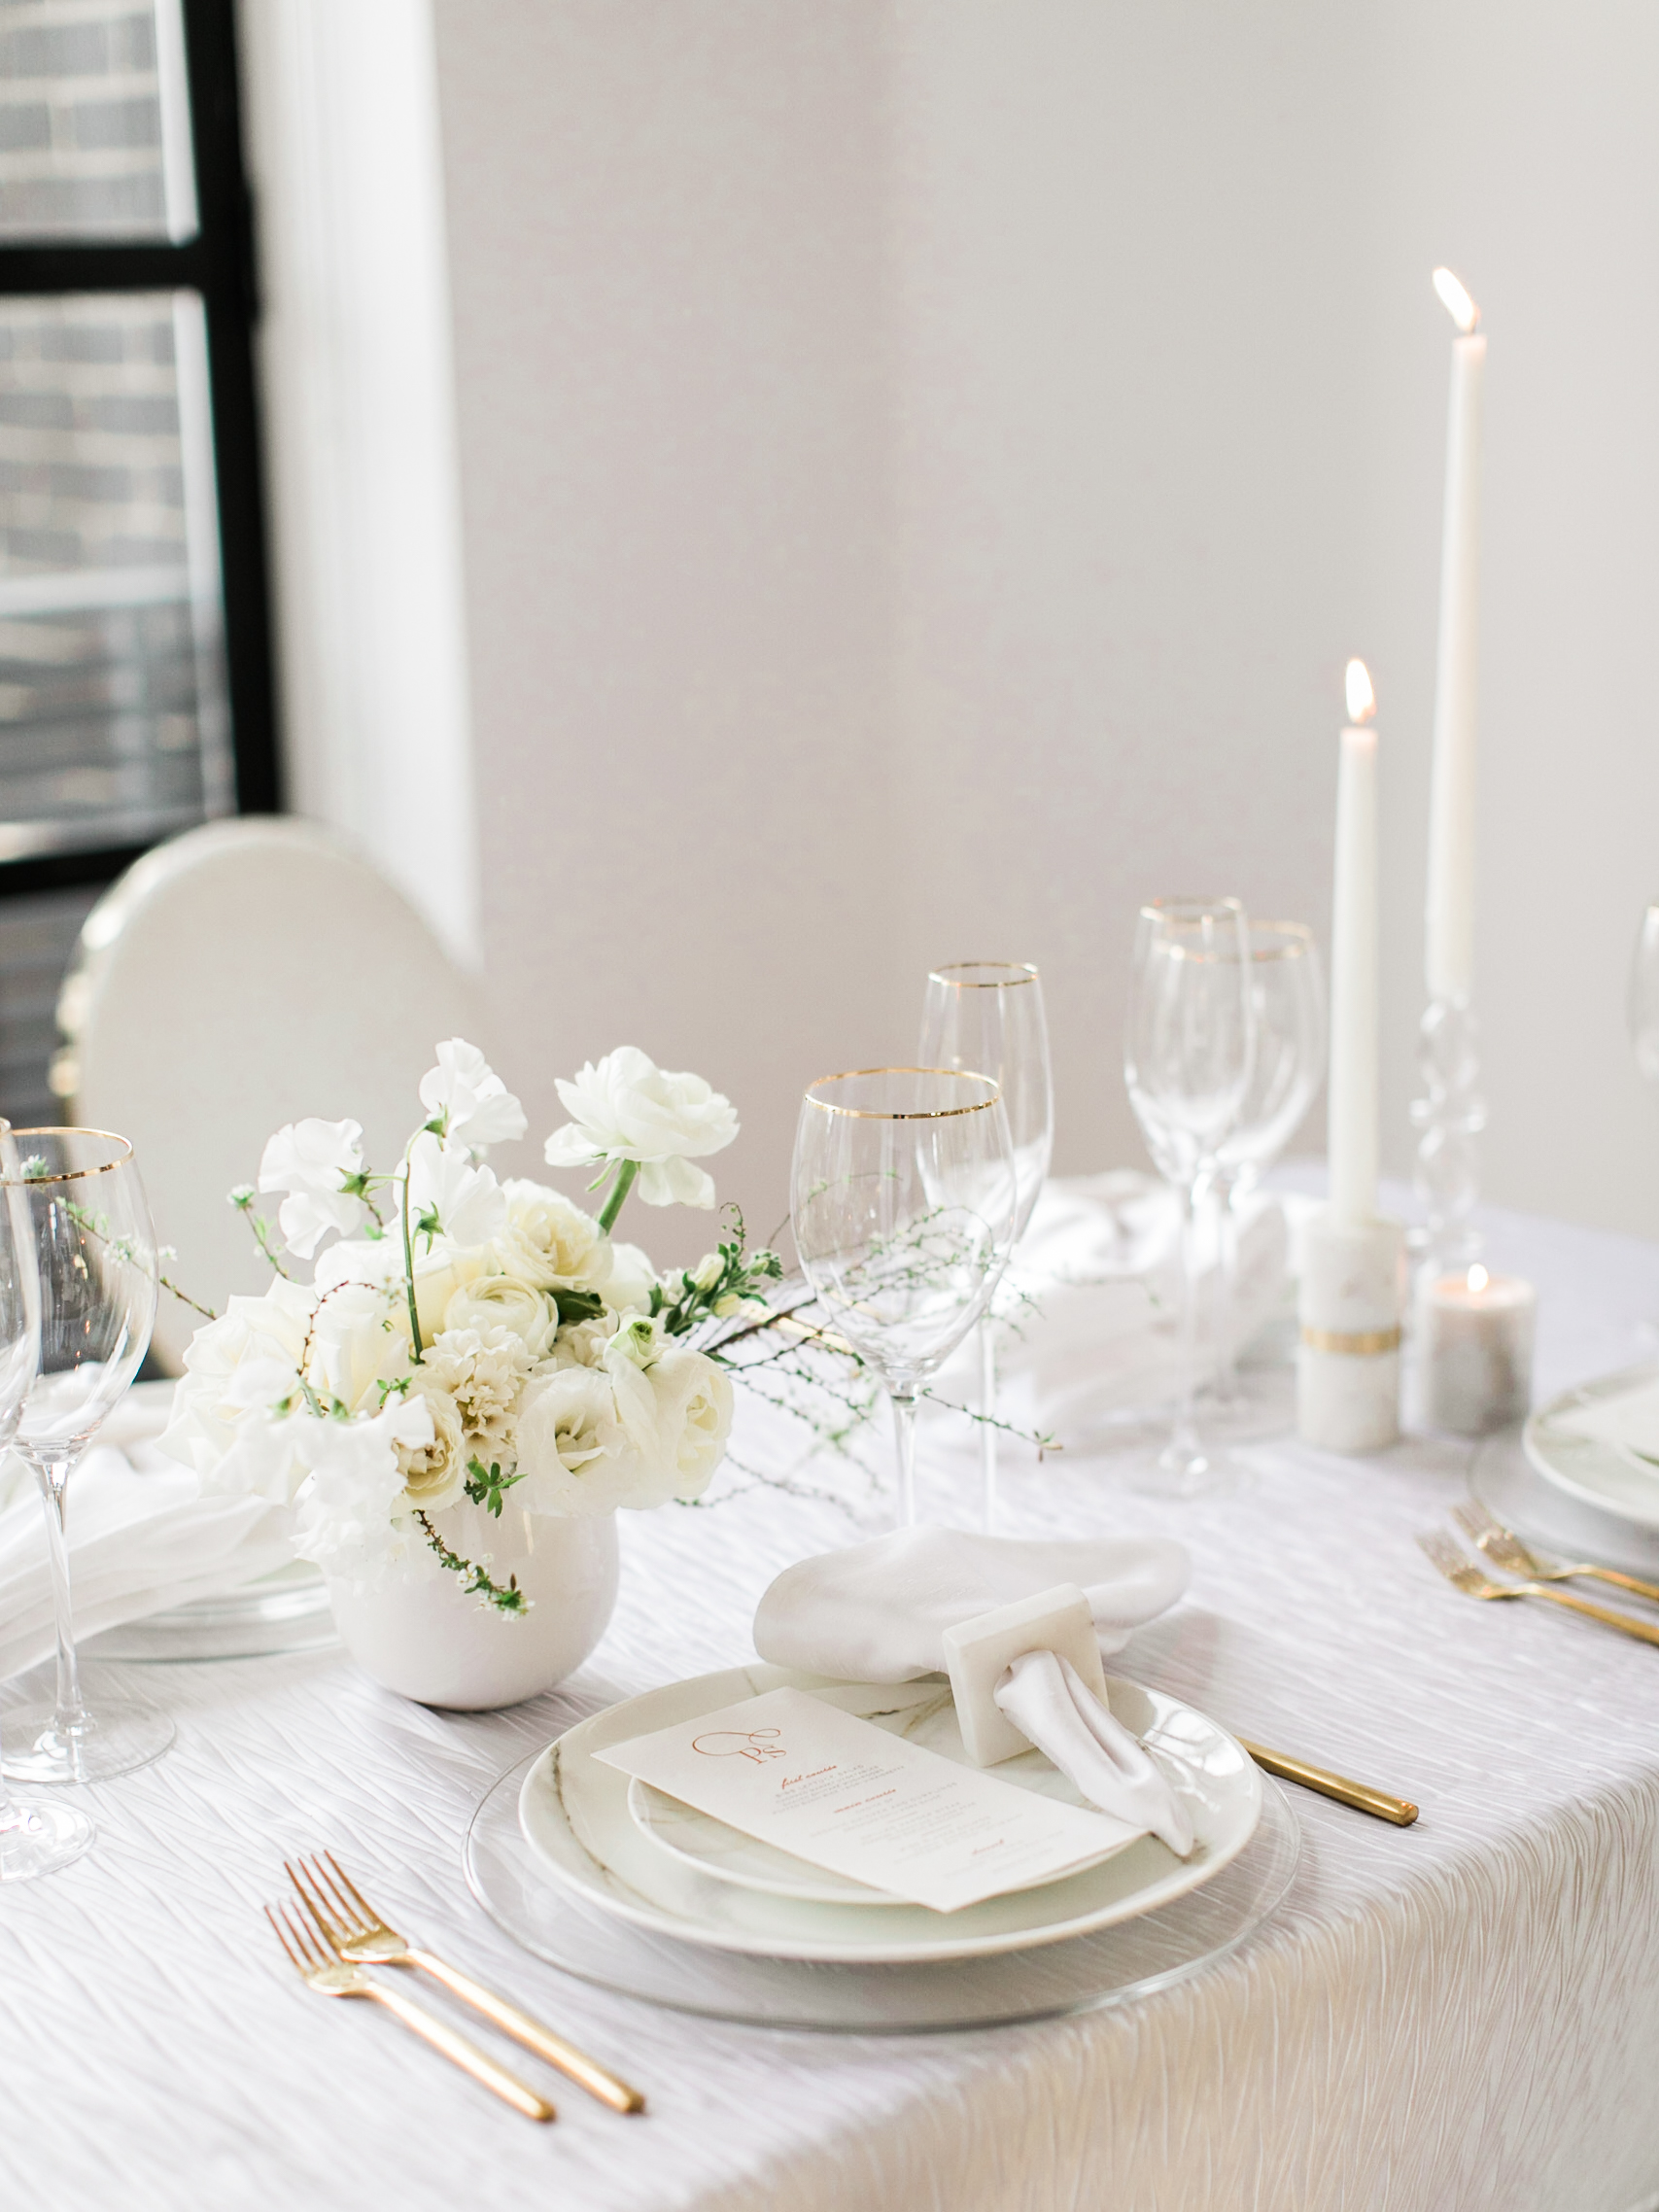 asher-gardner-photography-bryant-park-wedding-00301.jpg